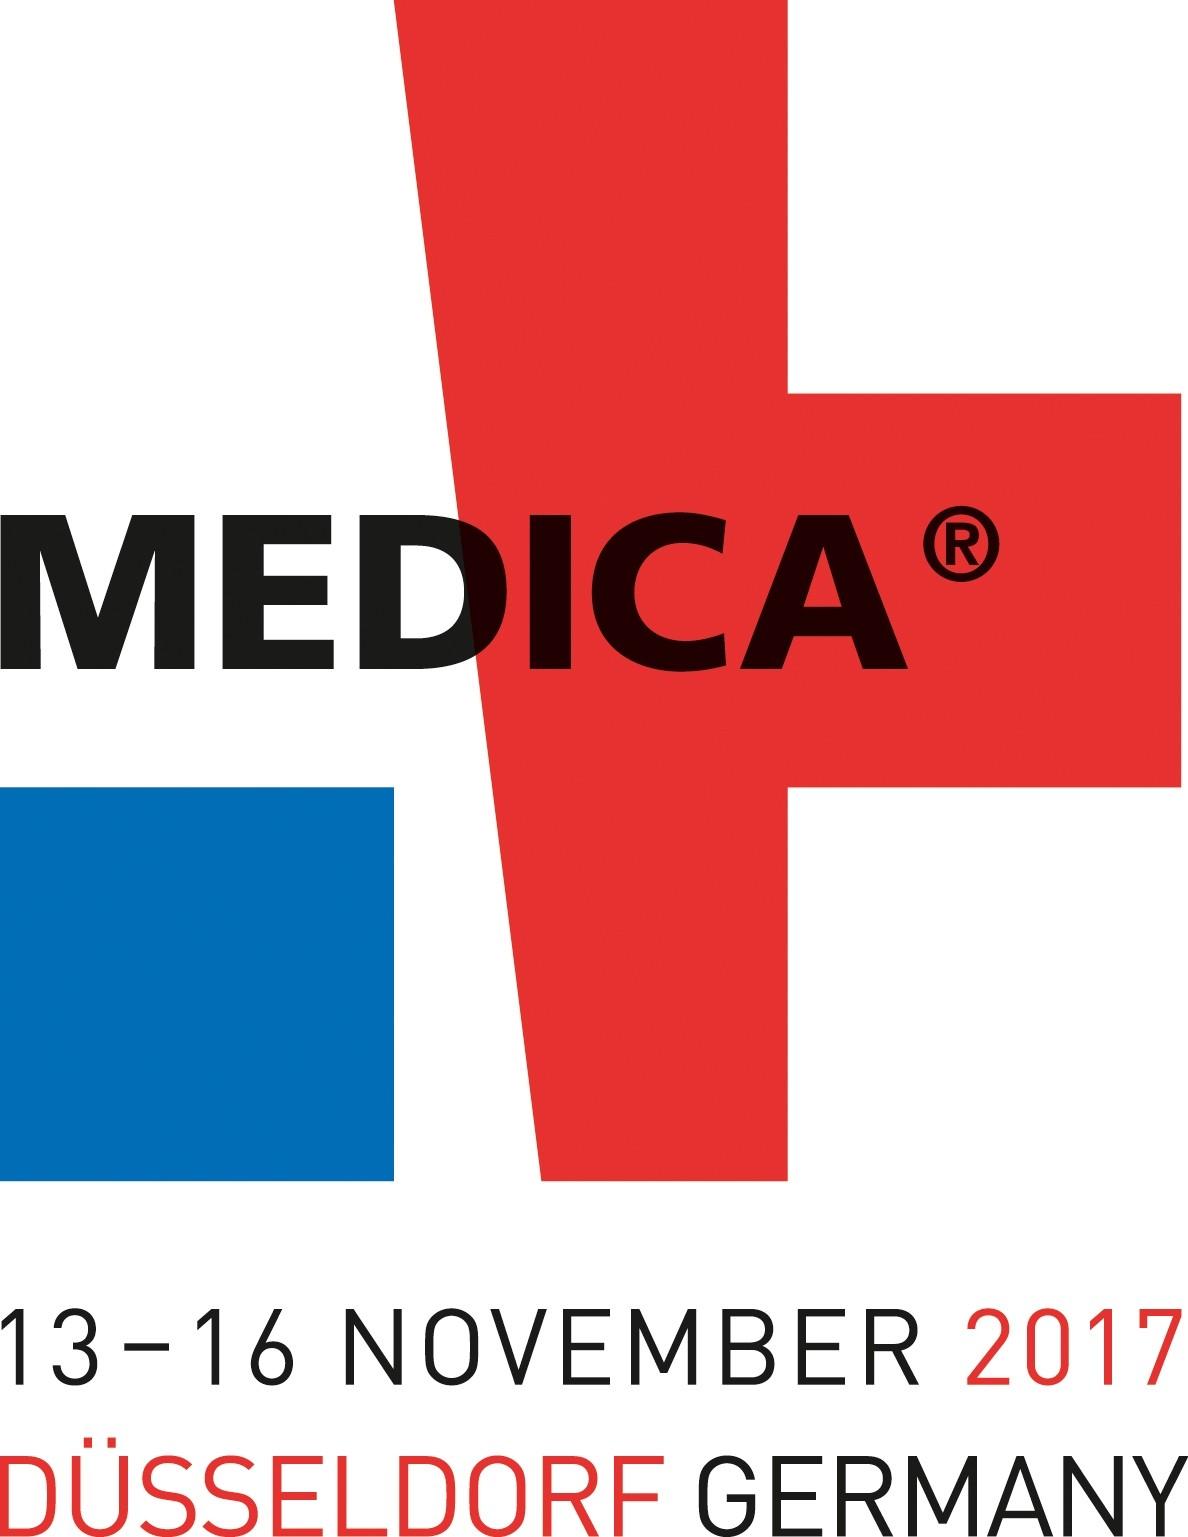 MEDICA 2017 in Düsseldorf